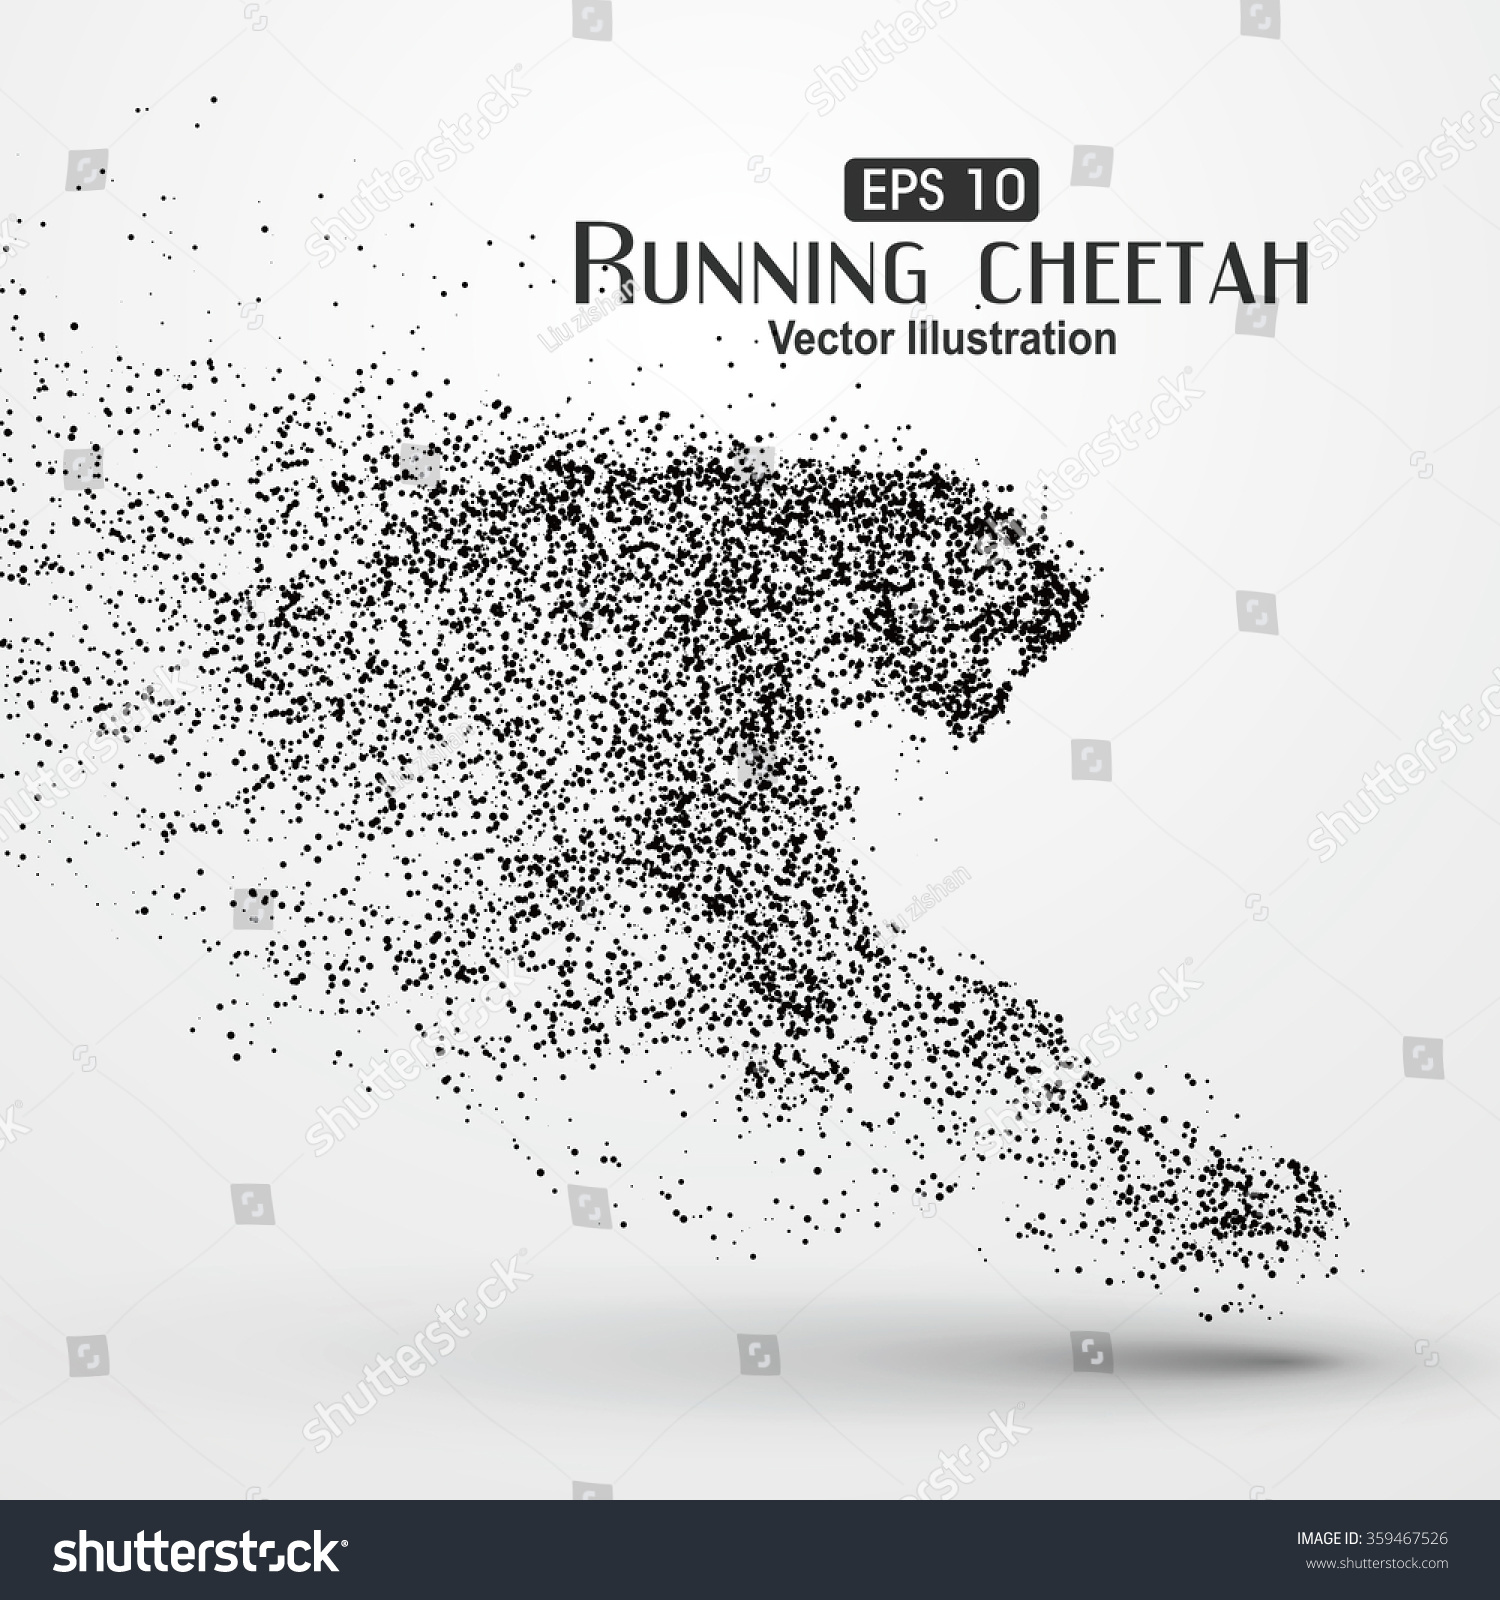 Chester Cheetah Illustrations On Behance: Particle Cheetah Vector Illustration Stock Vector